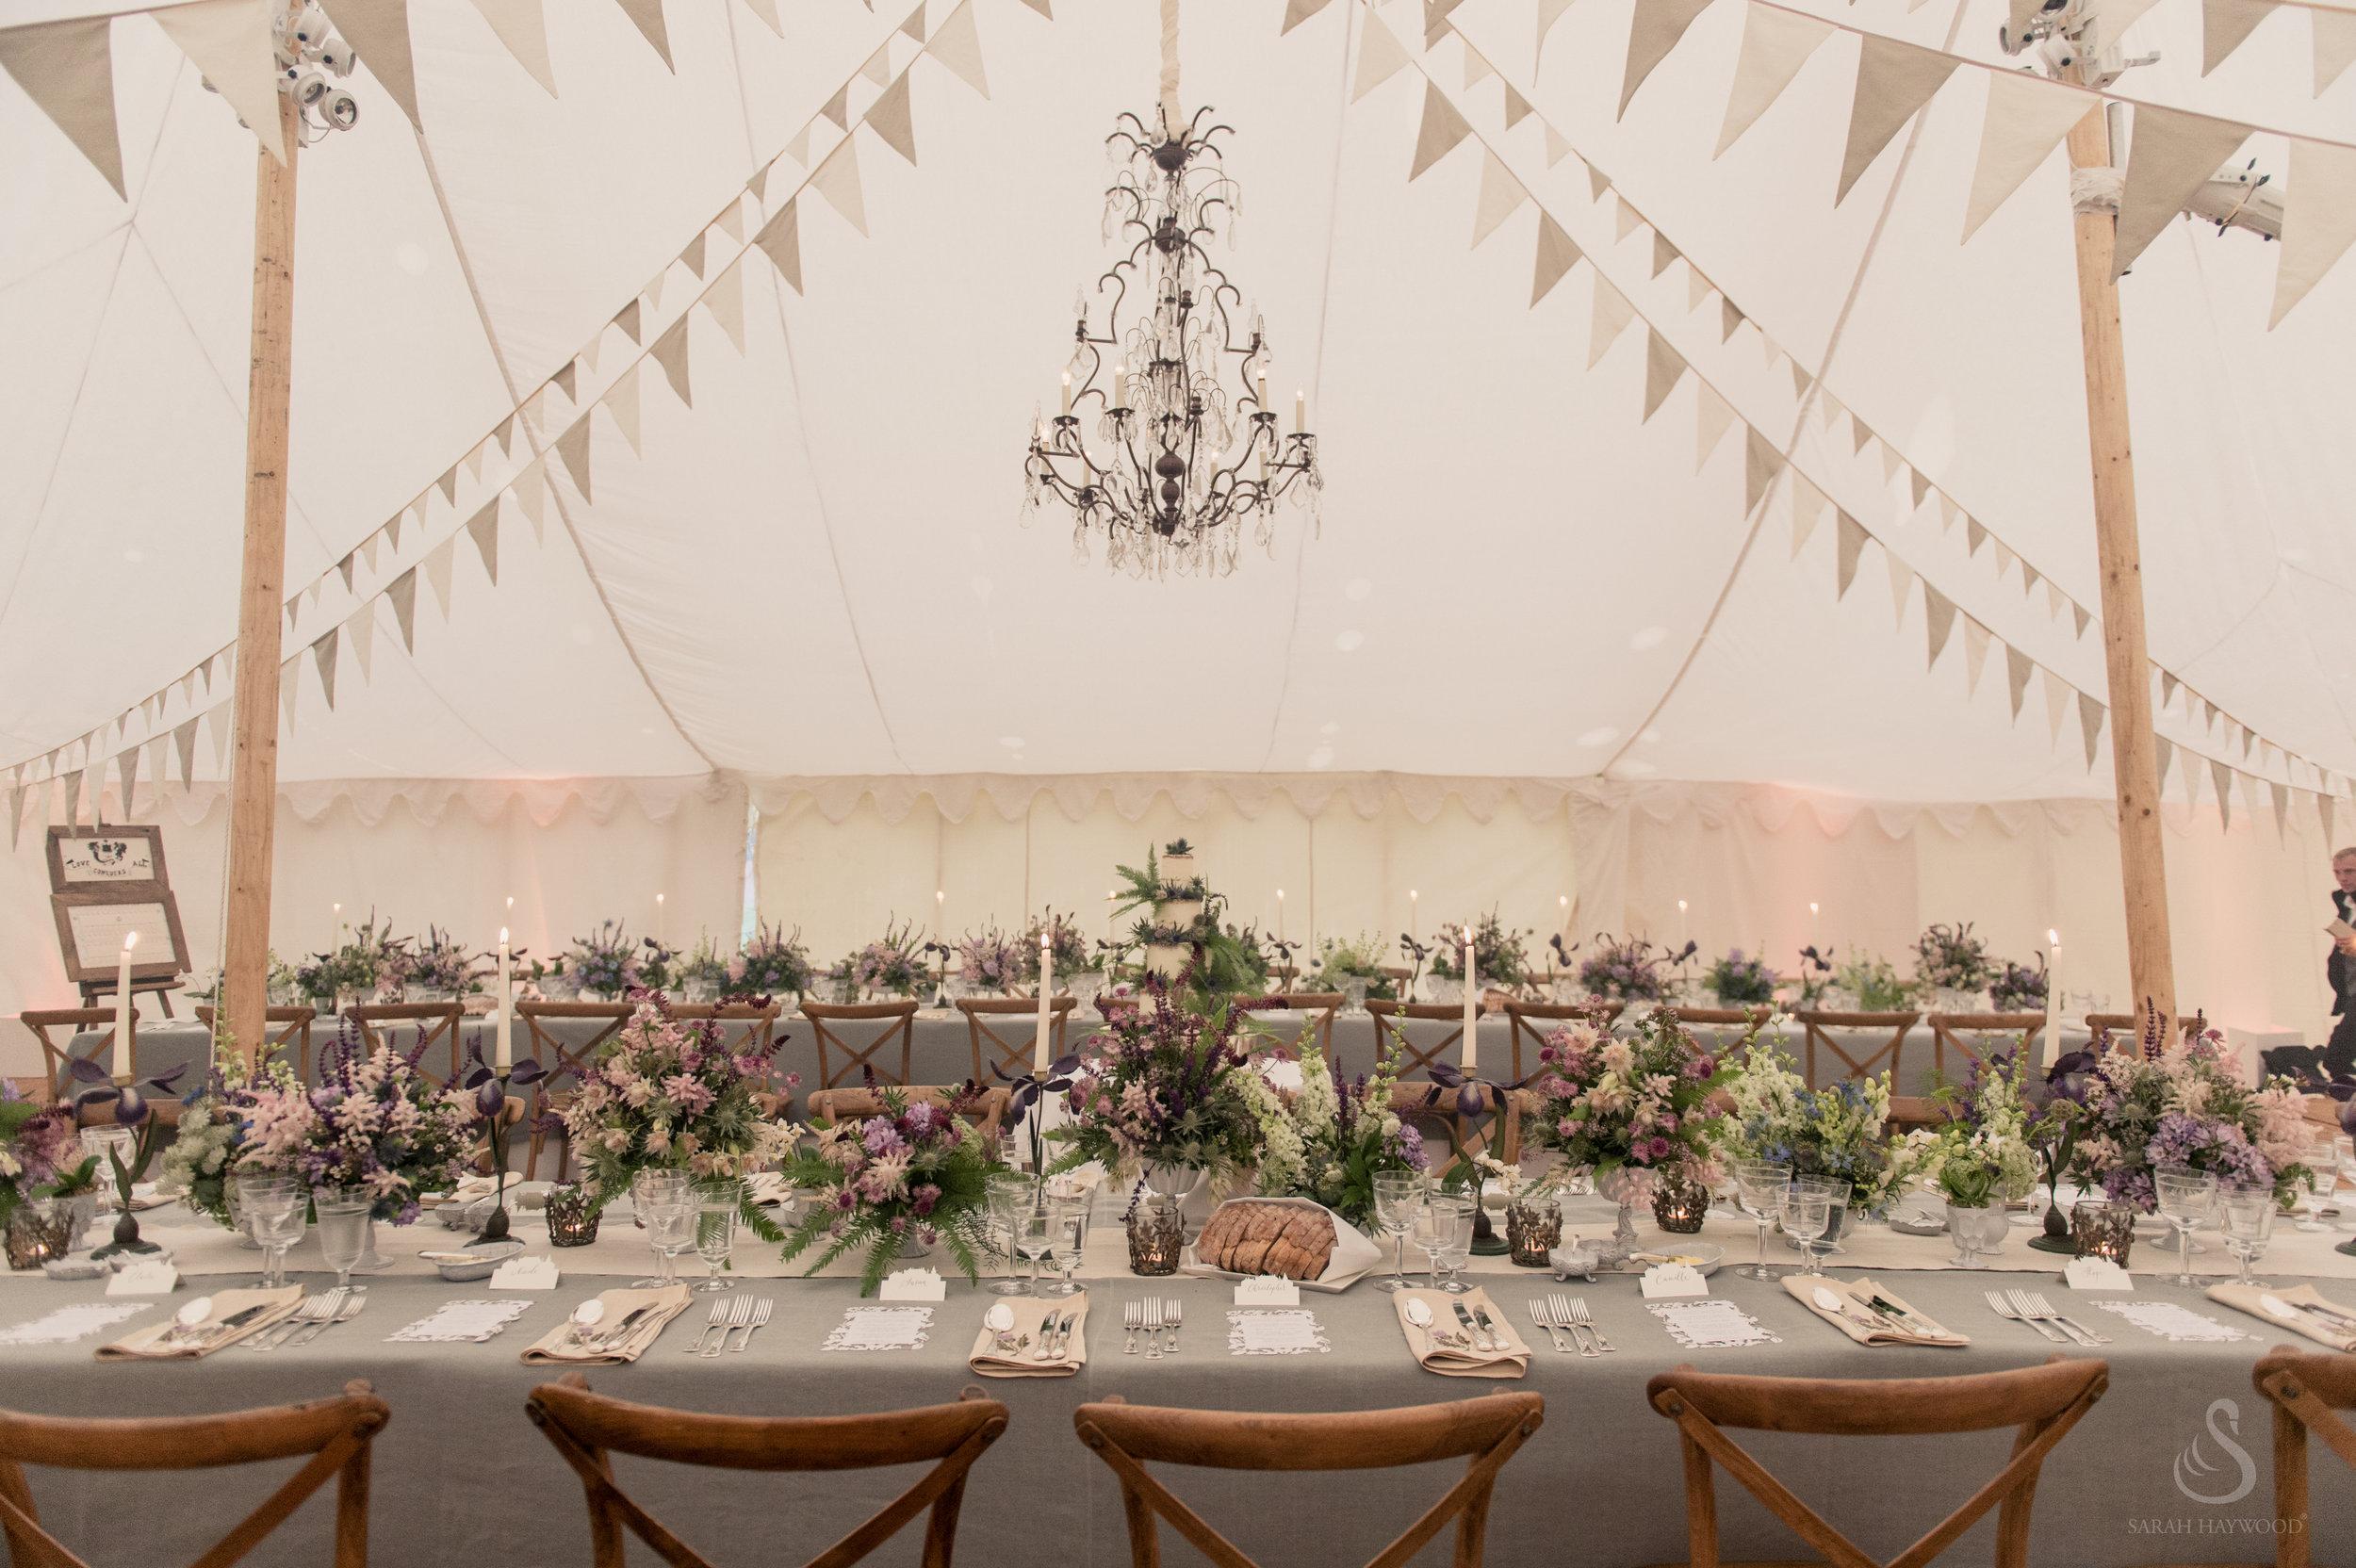 Scotland_Wedding_copyright_Carla Ten Eyck_for Sarah Haywood Wedding Design_2220 copy.jpg